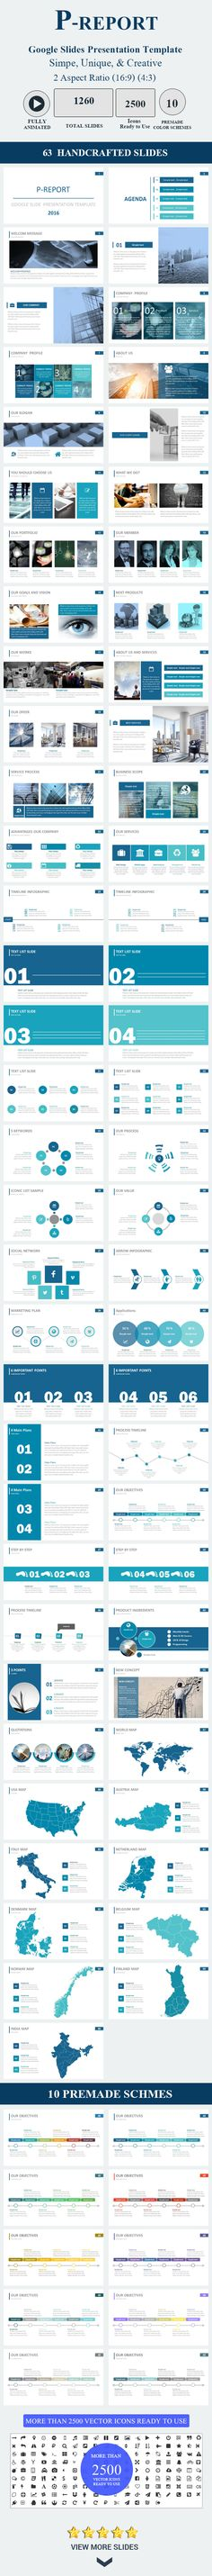 Brand Guideline document template Designer Egotype Branding - manual format template